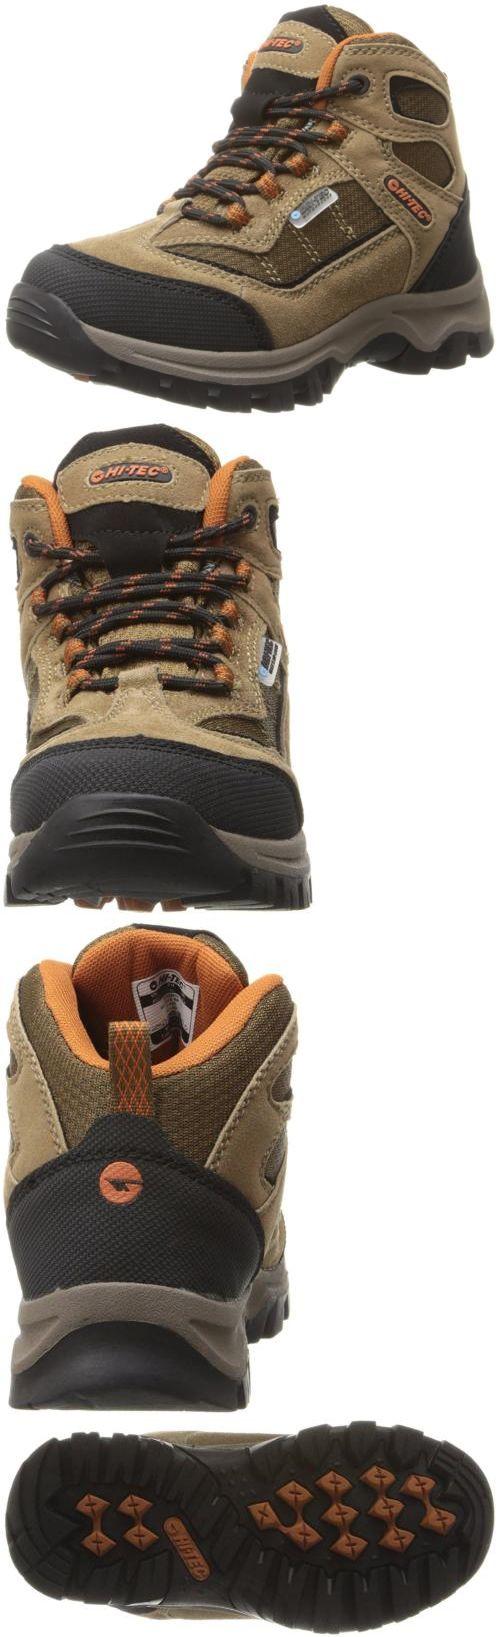 Kids 181394: Hi Tec Kids Unisex Hillside Waterproof Jr Hiking Boot Toddler Little Kid Big... -> BUY IT NOW ONLY: $78.69 on eBay!